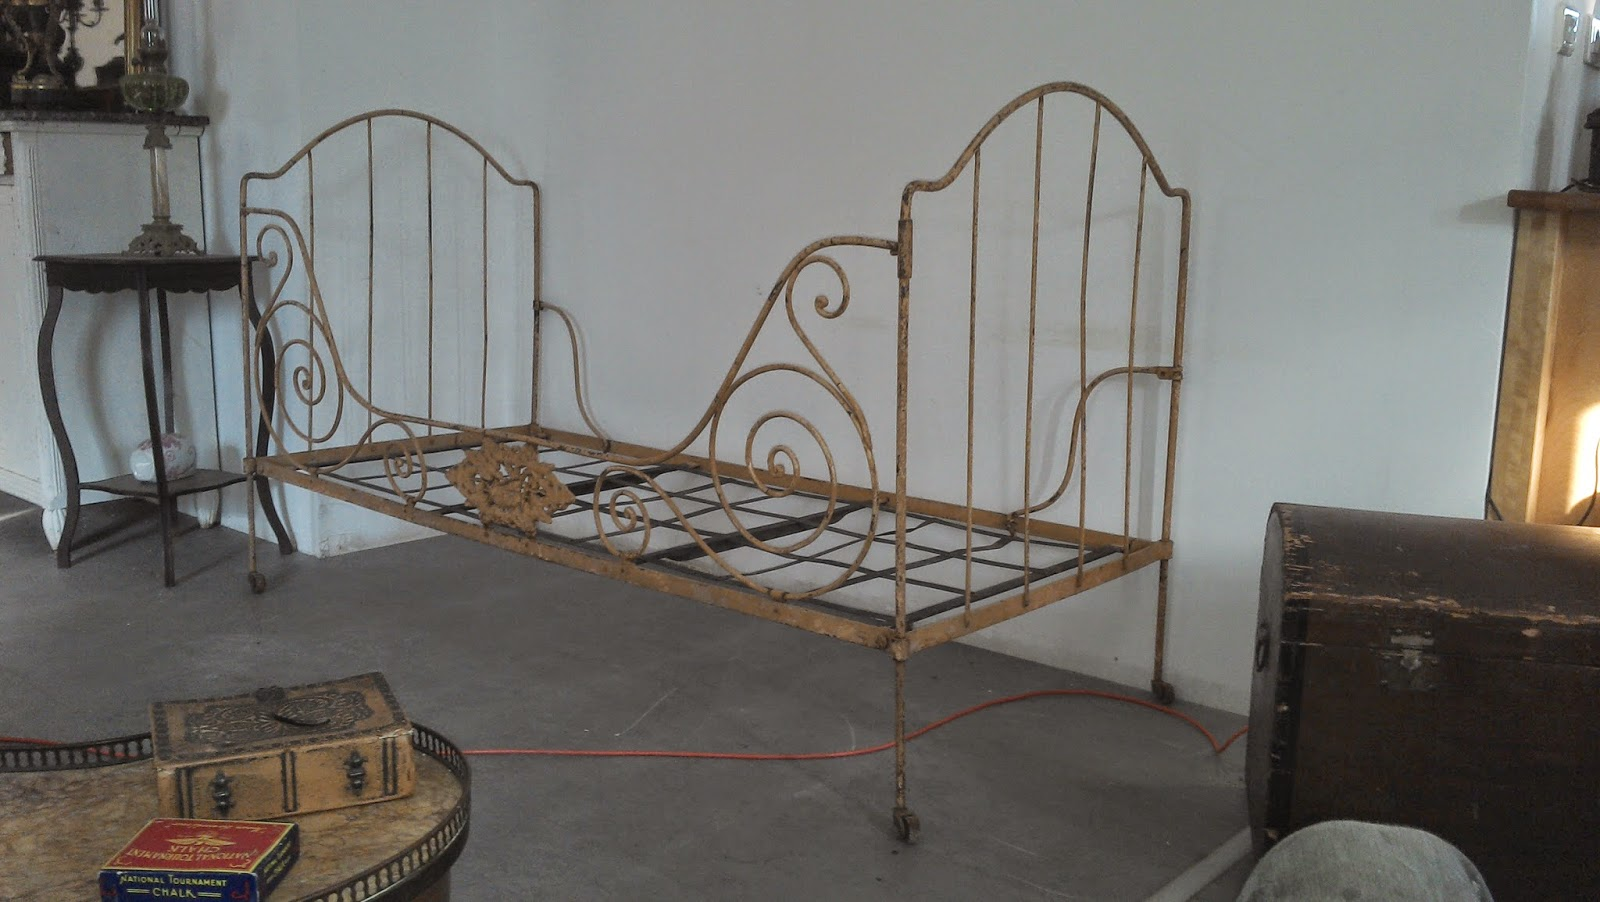 En fer forg banquette art populaire banc mobilier de for Mobilier de jardin en fer forge